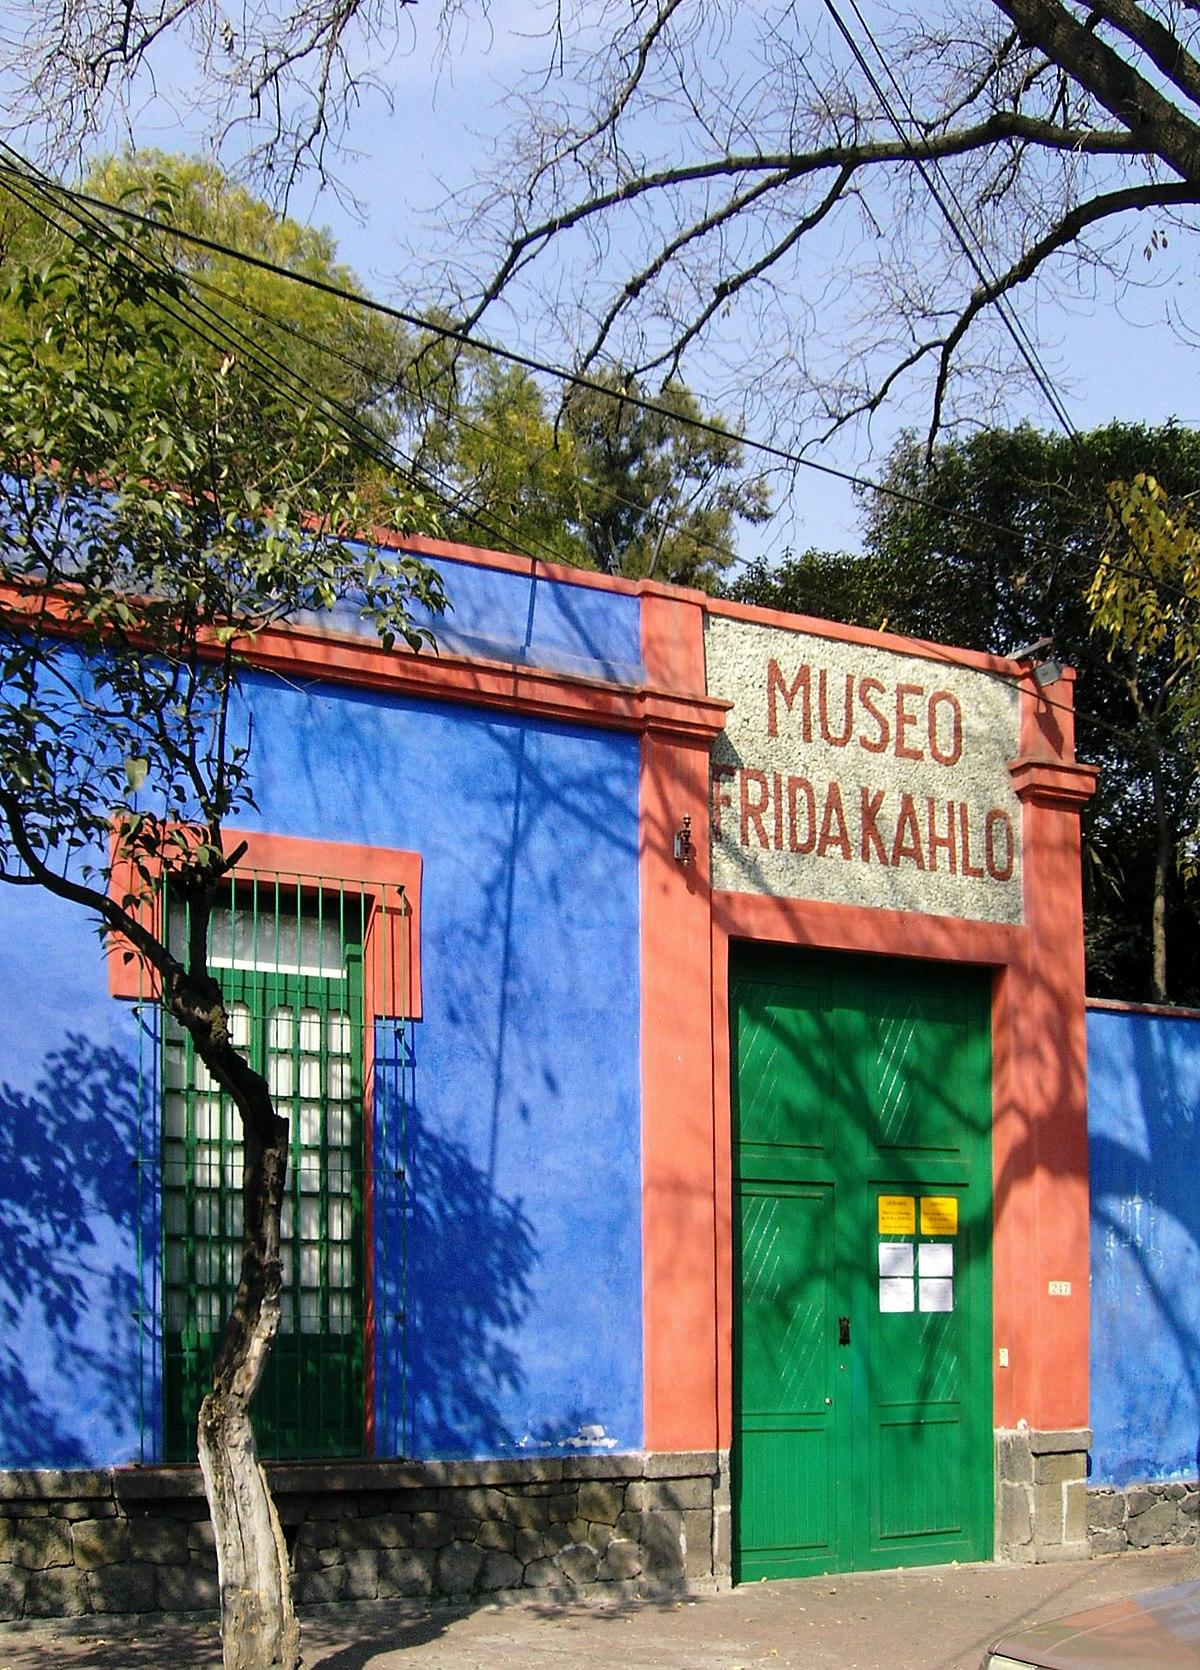 Museo frida kahlo wikipedia la enciclopedia libre for Cuartos decorados de frida kahlo